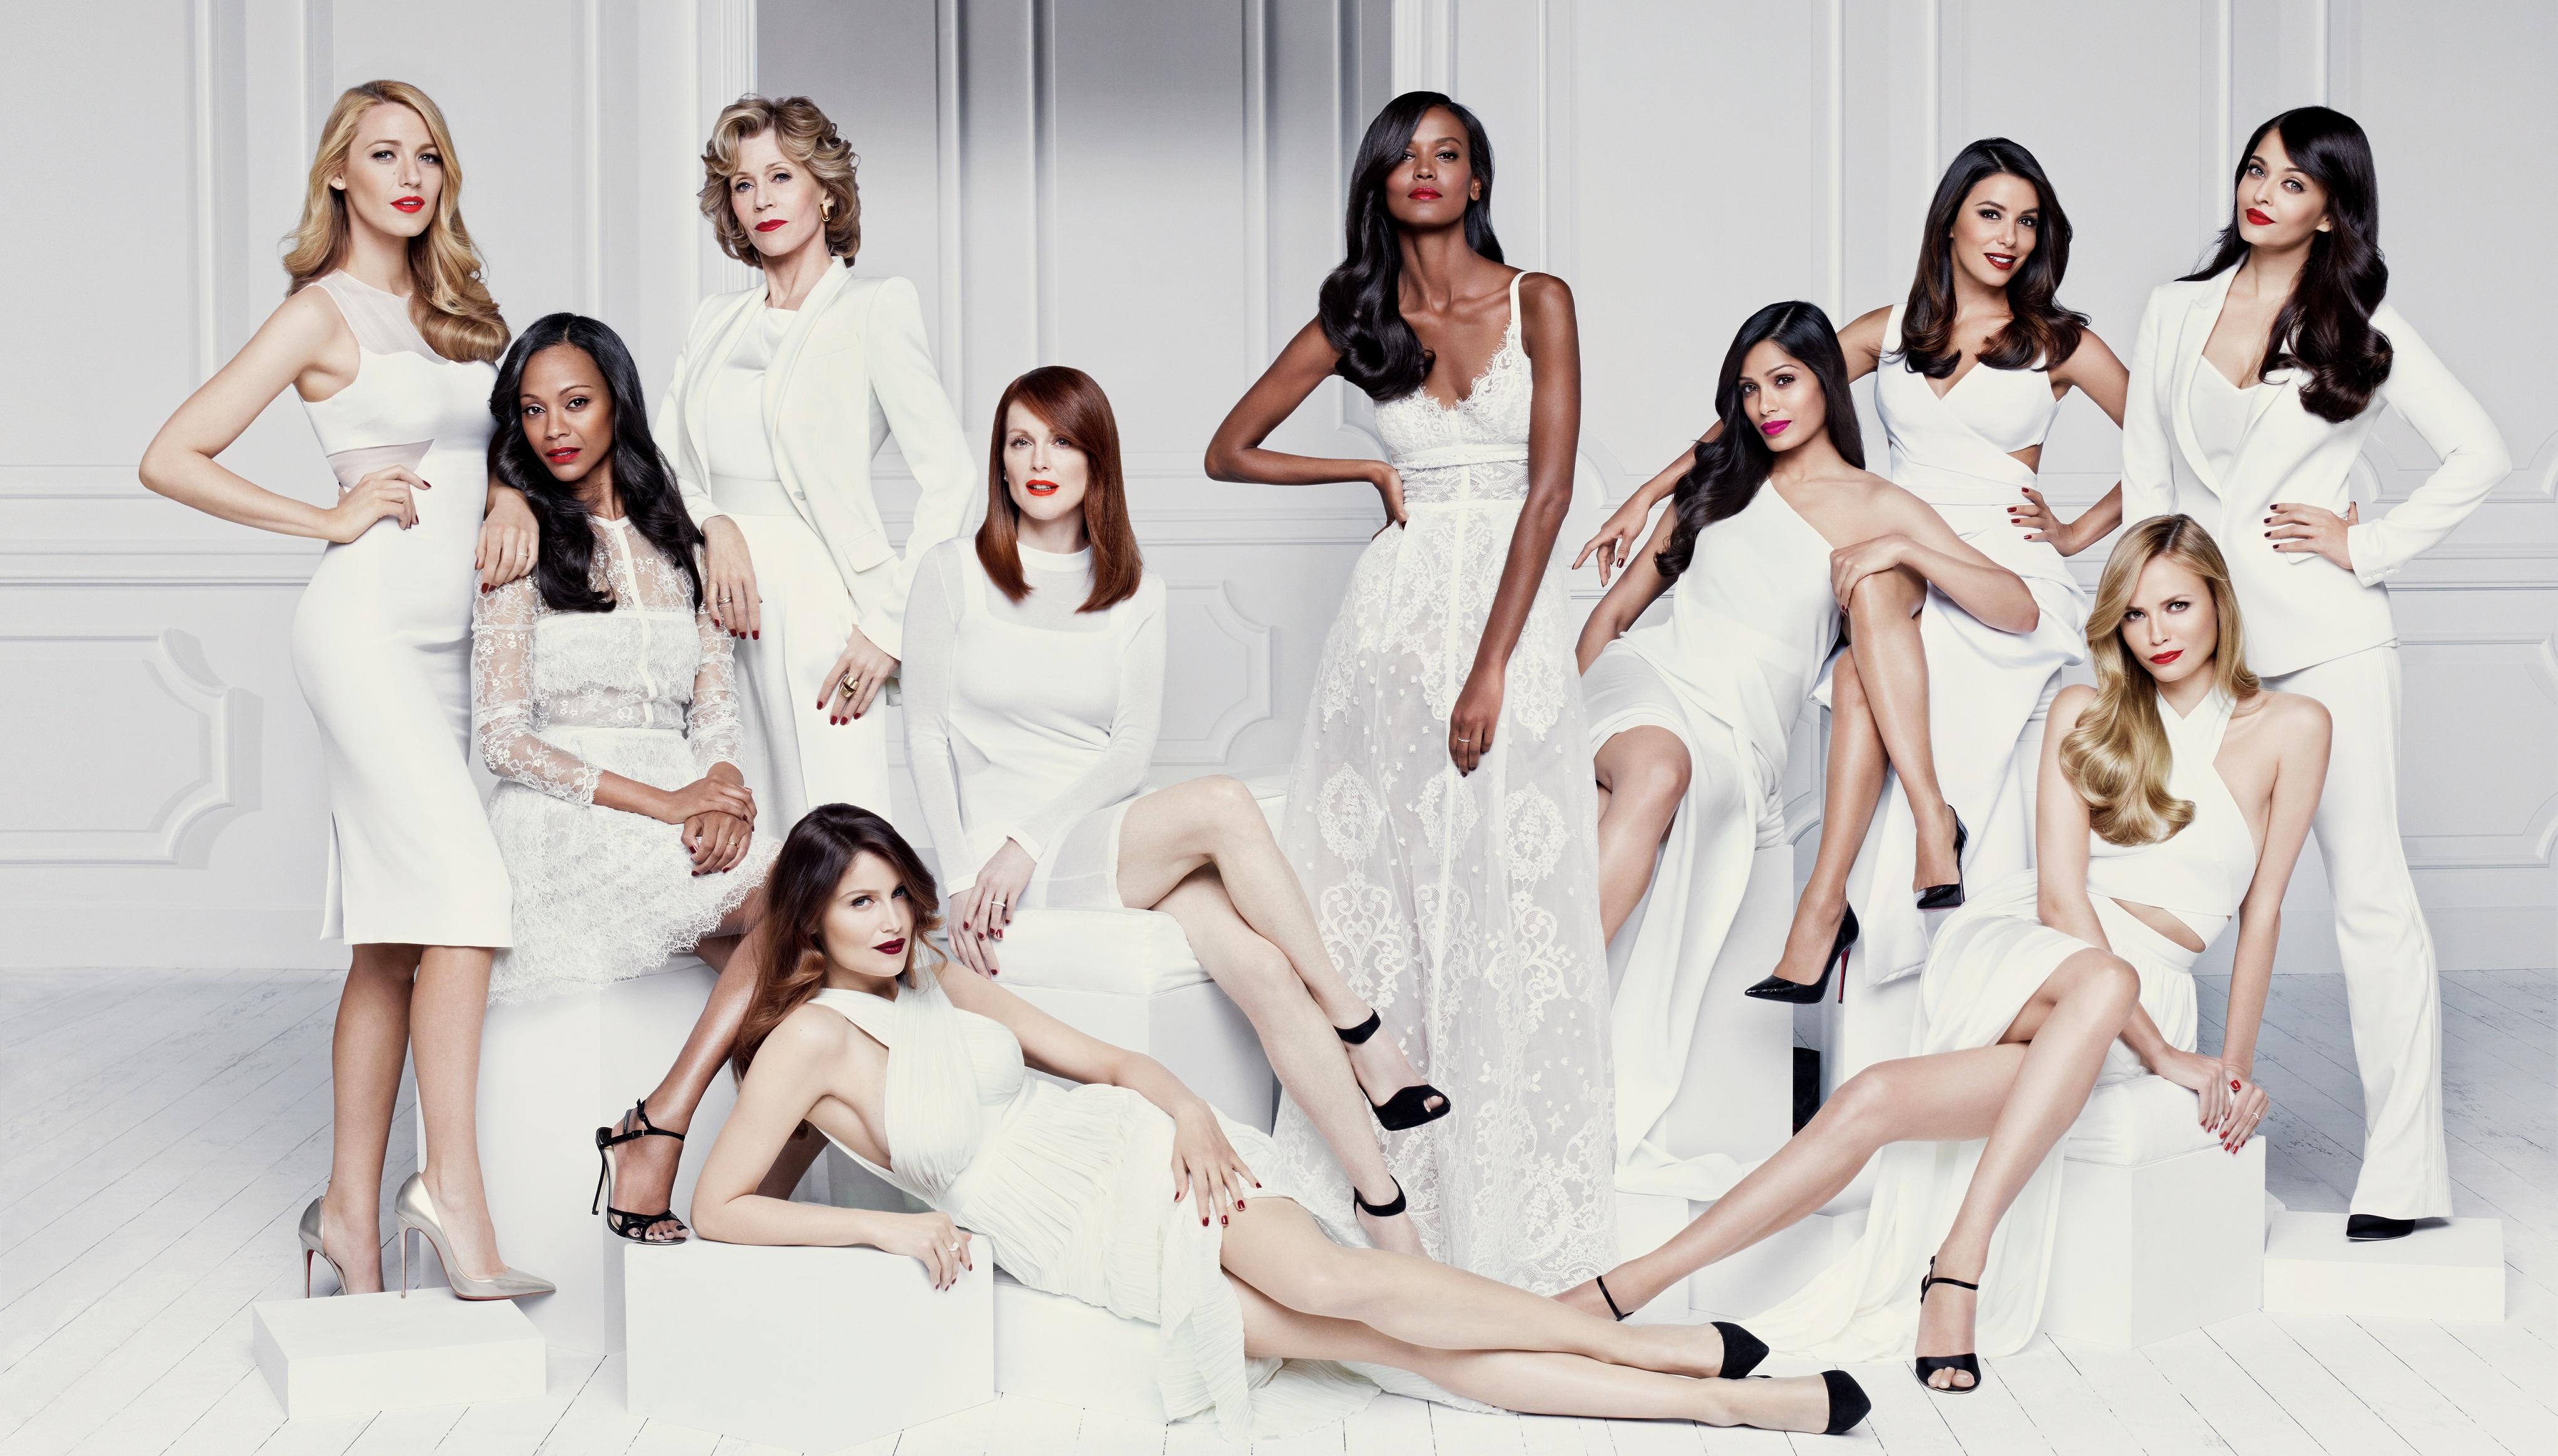 Embajadoras L'Oréal Paris Collection Exclusive rojos mate